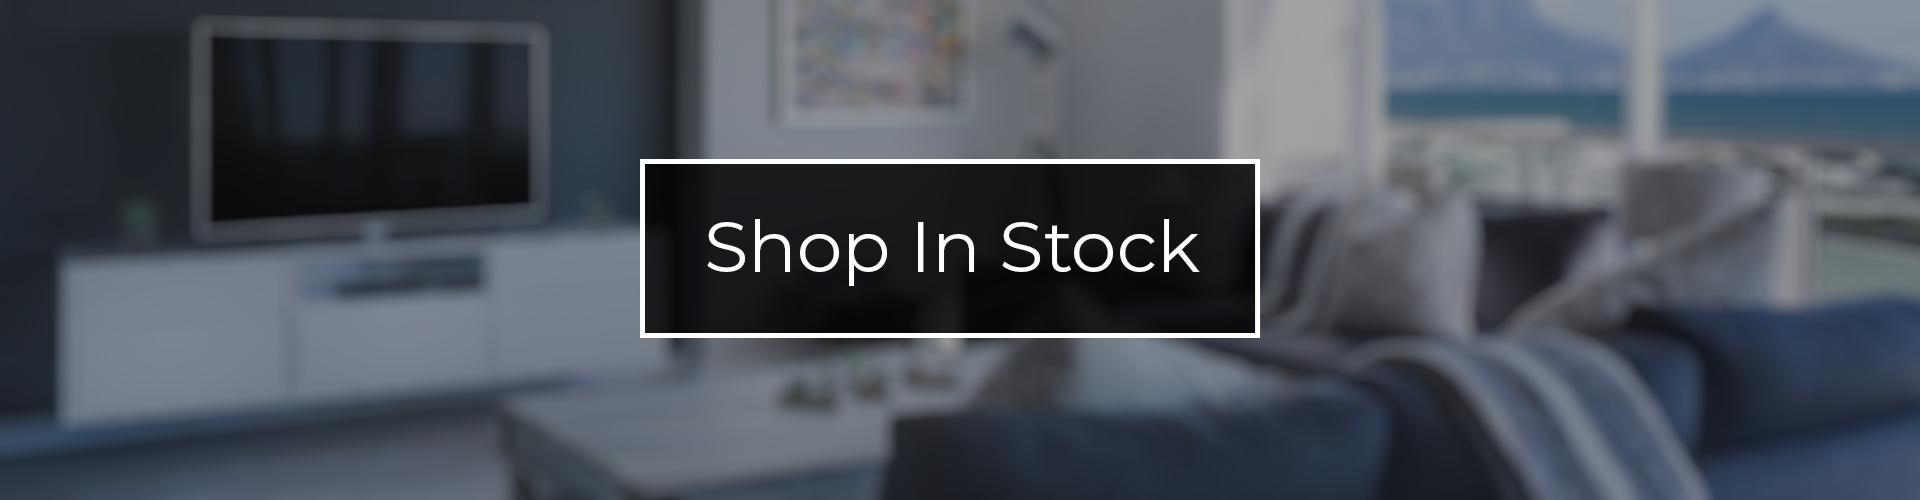 Shop In Stock furniture